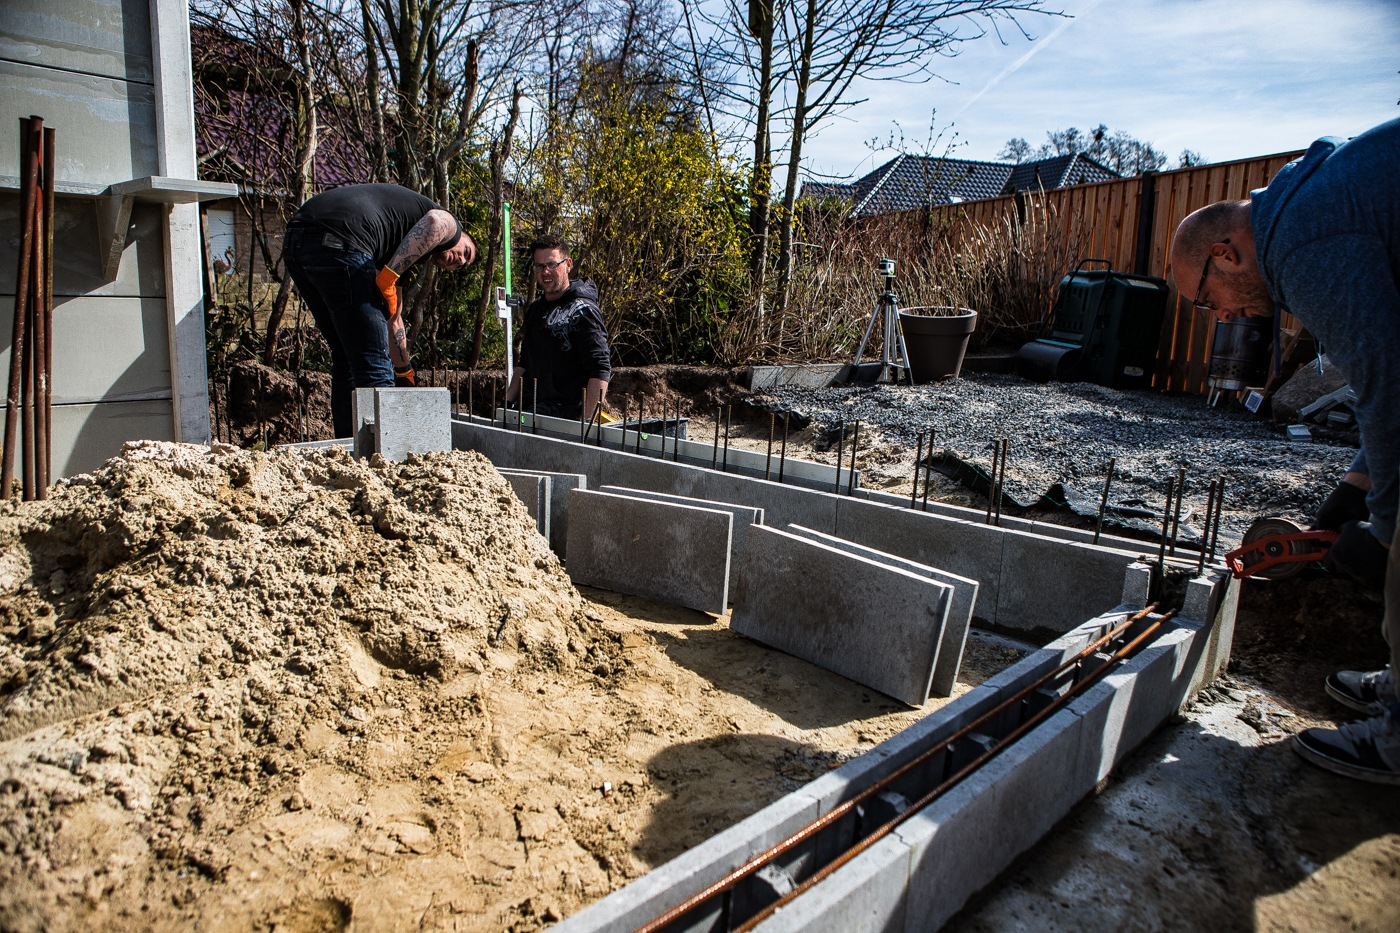 Outdoor Küche Fundament : Projekt outdoorküche teil planung und fundament gießen